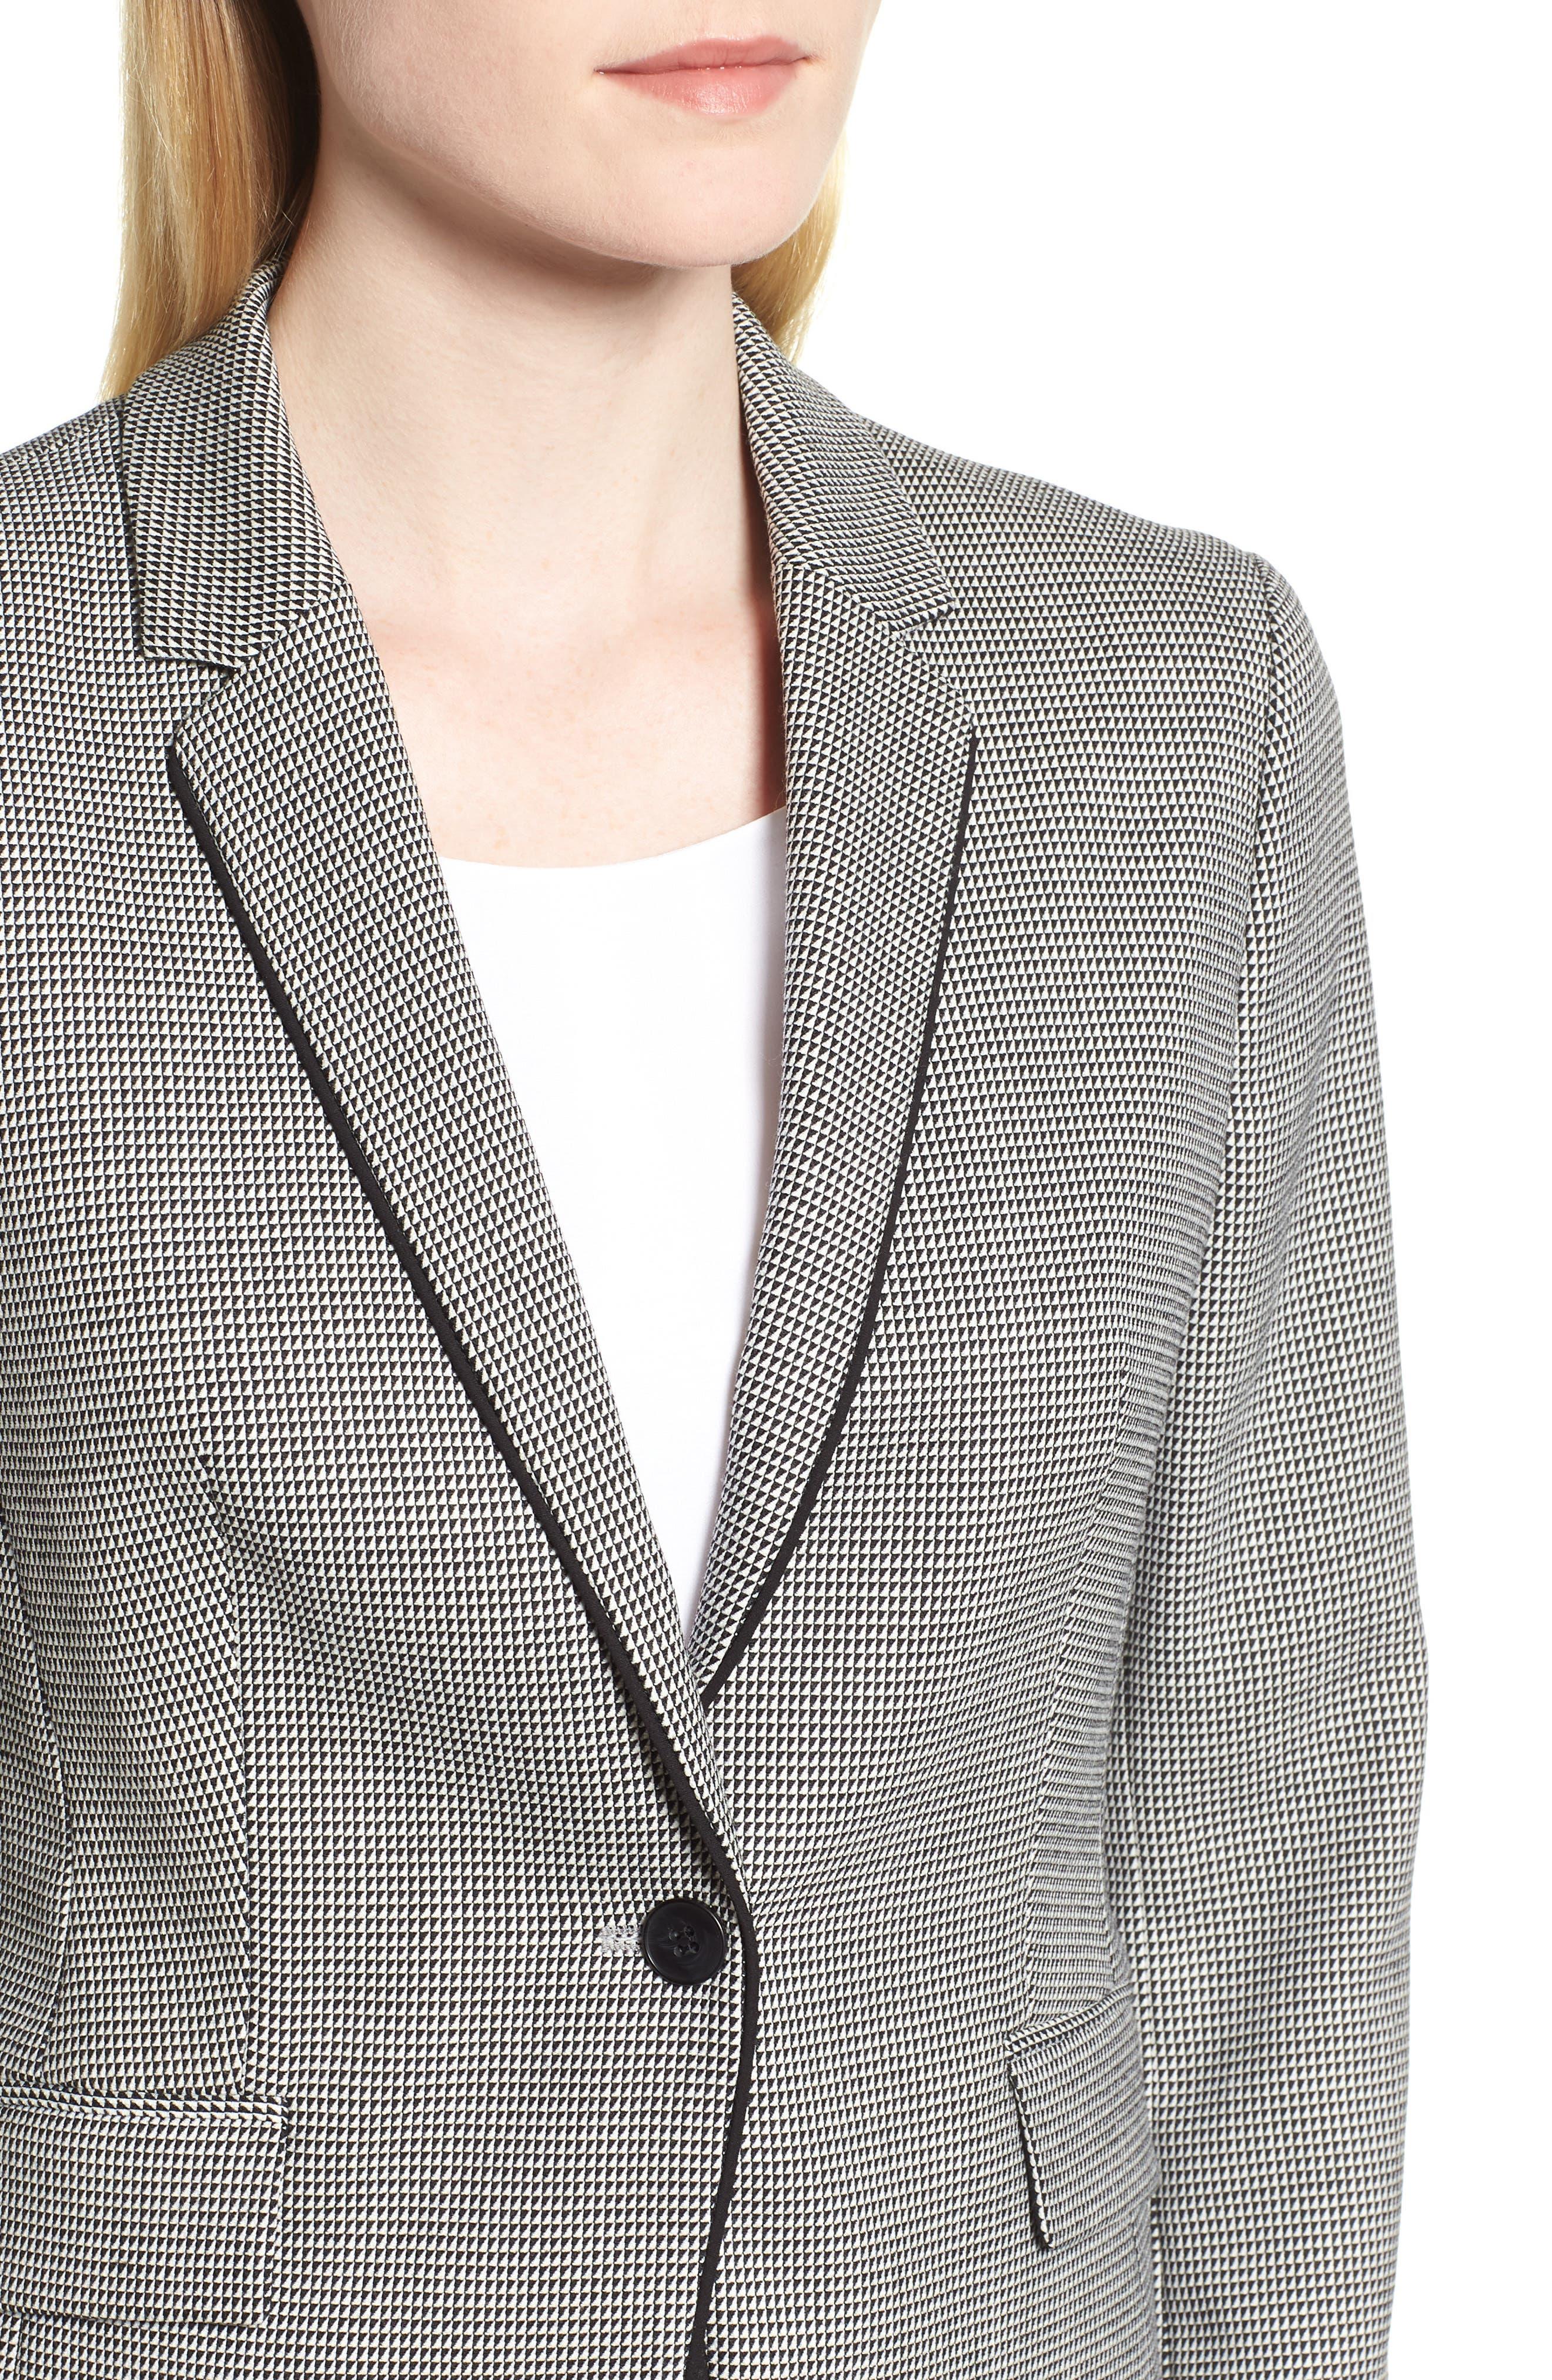 Jorita Wool Blend Suit Jacket,                             Alternate thumbnail 4, color,                             Black Fantasy